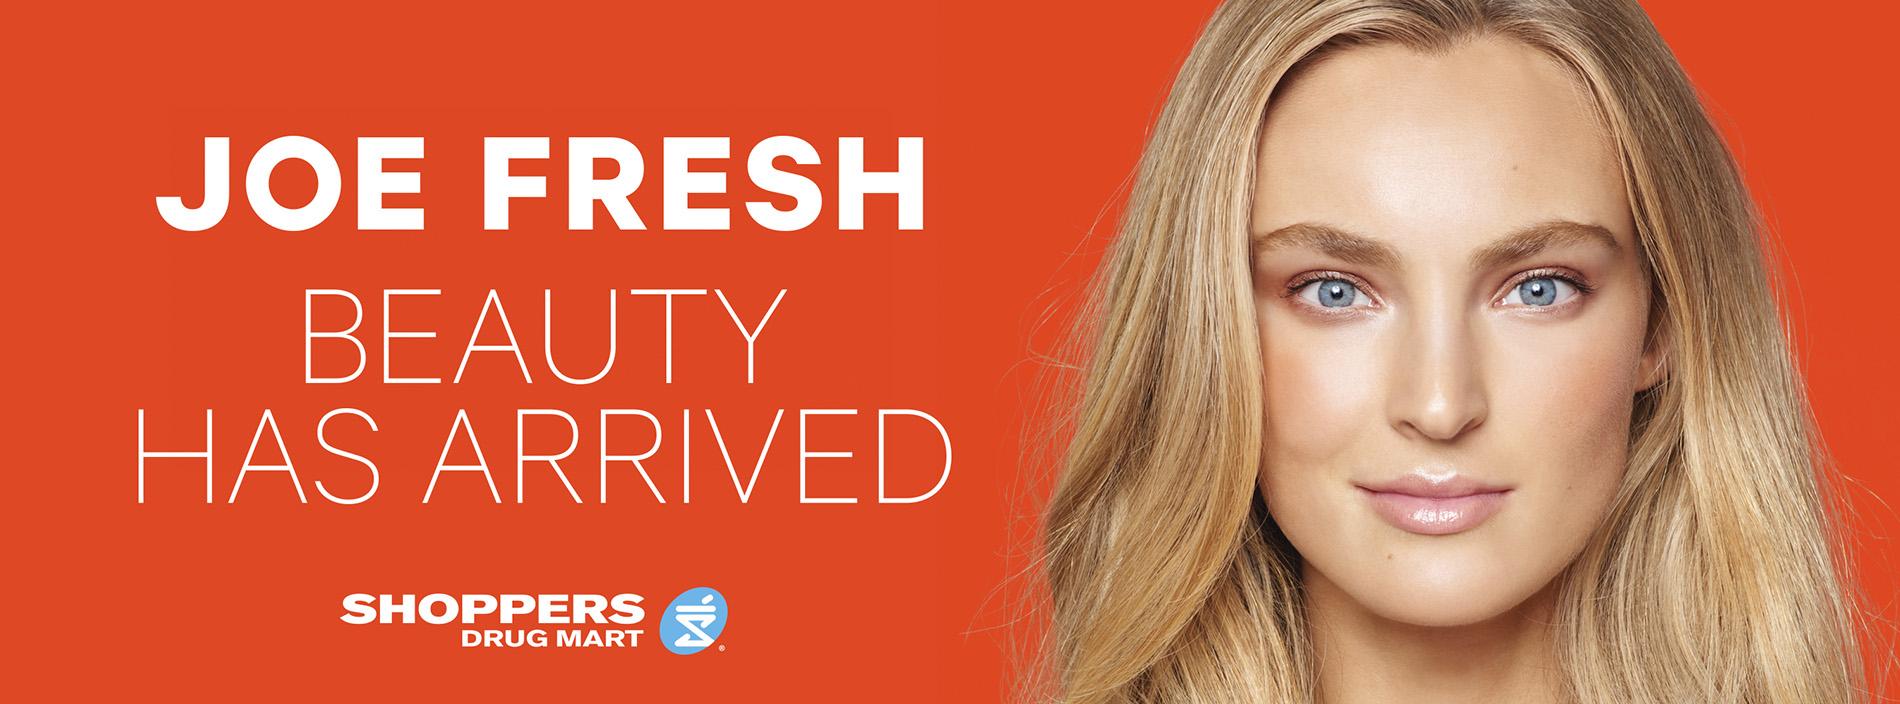 Canadian Beauty Leader Shoppers Drug Mart Welcomes Joe Fresh Beauty